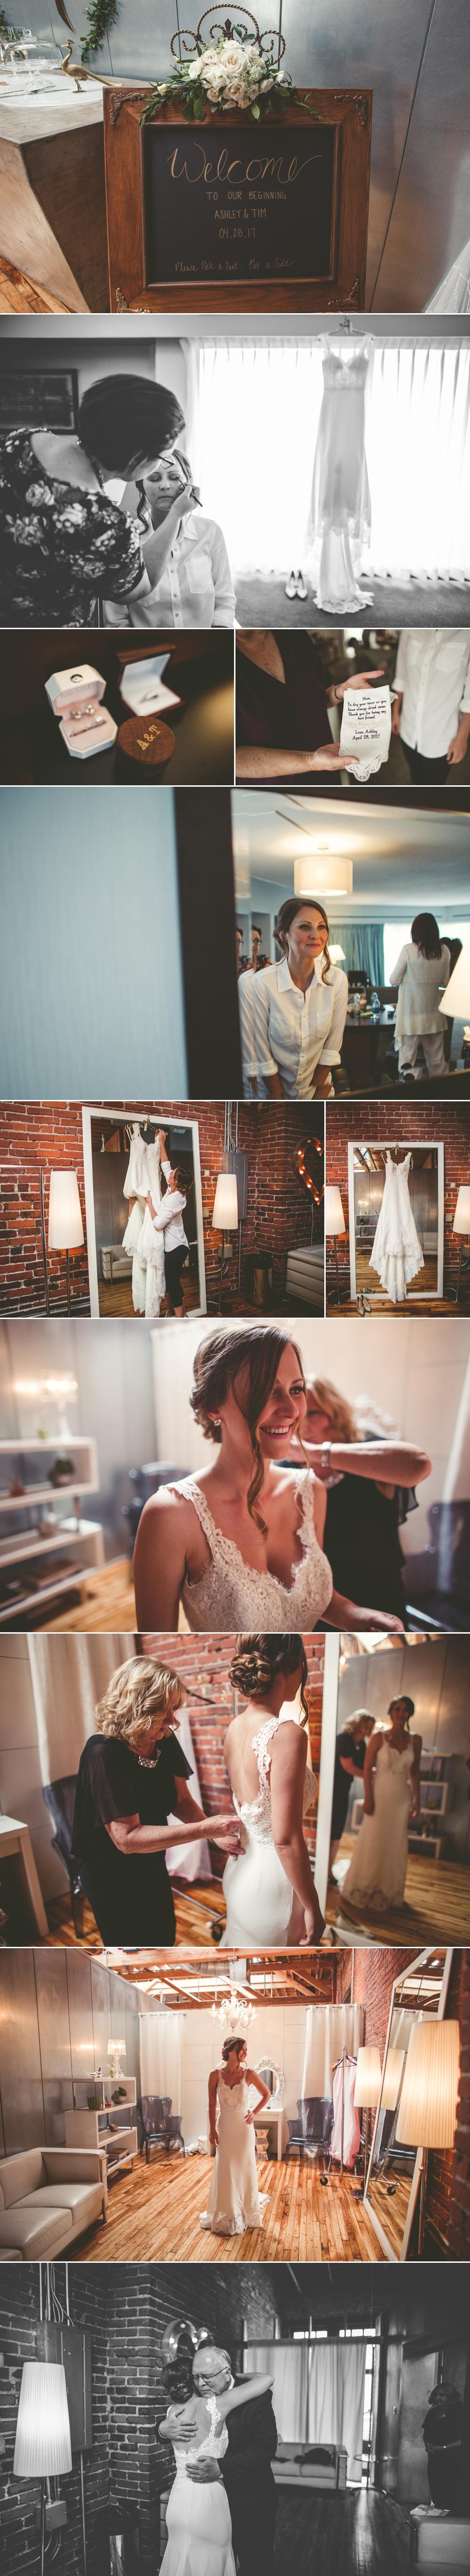 jason_domingues_photography_best_kansas_city_wedding_photographer_kc_weddings_berg_0001.jpg